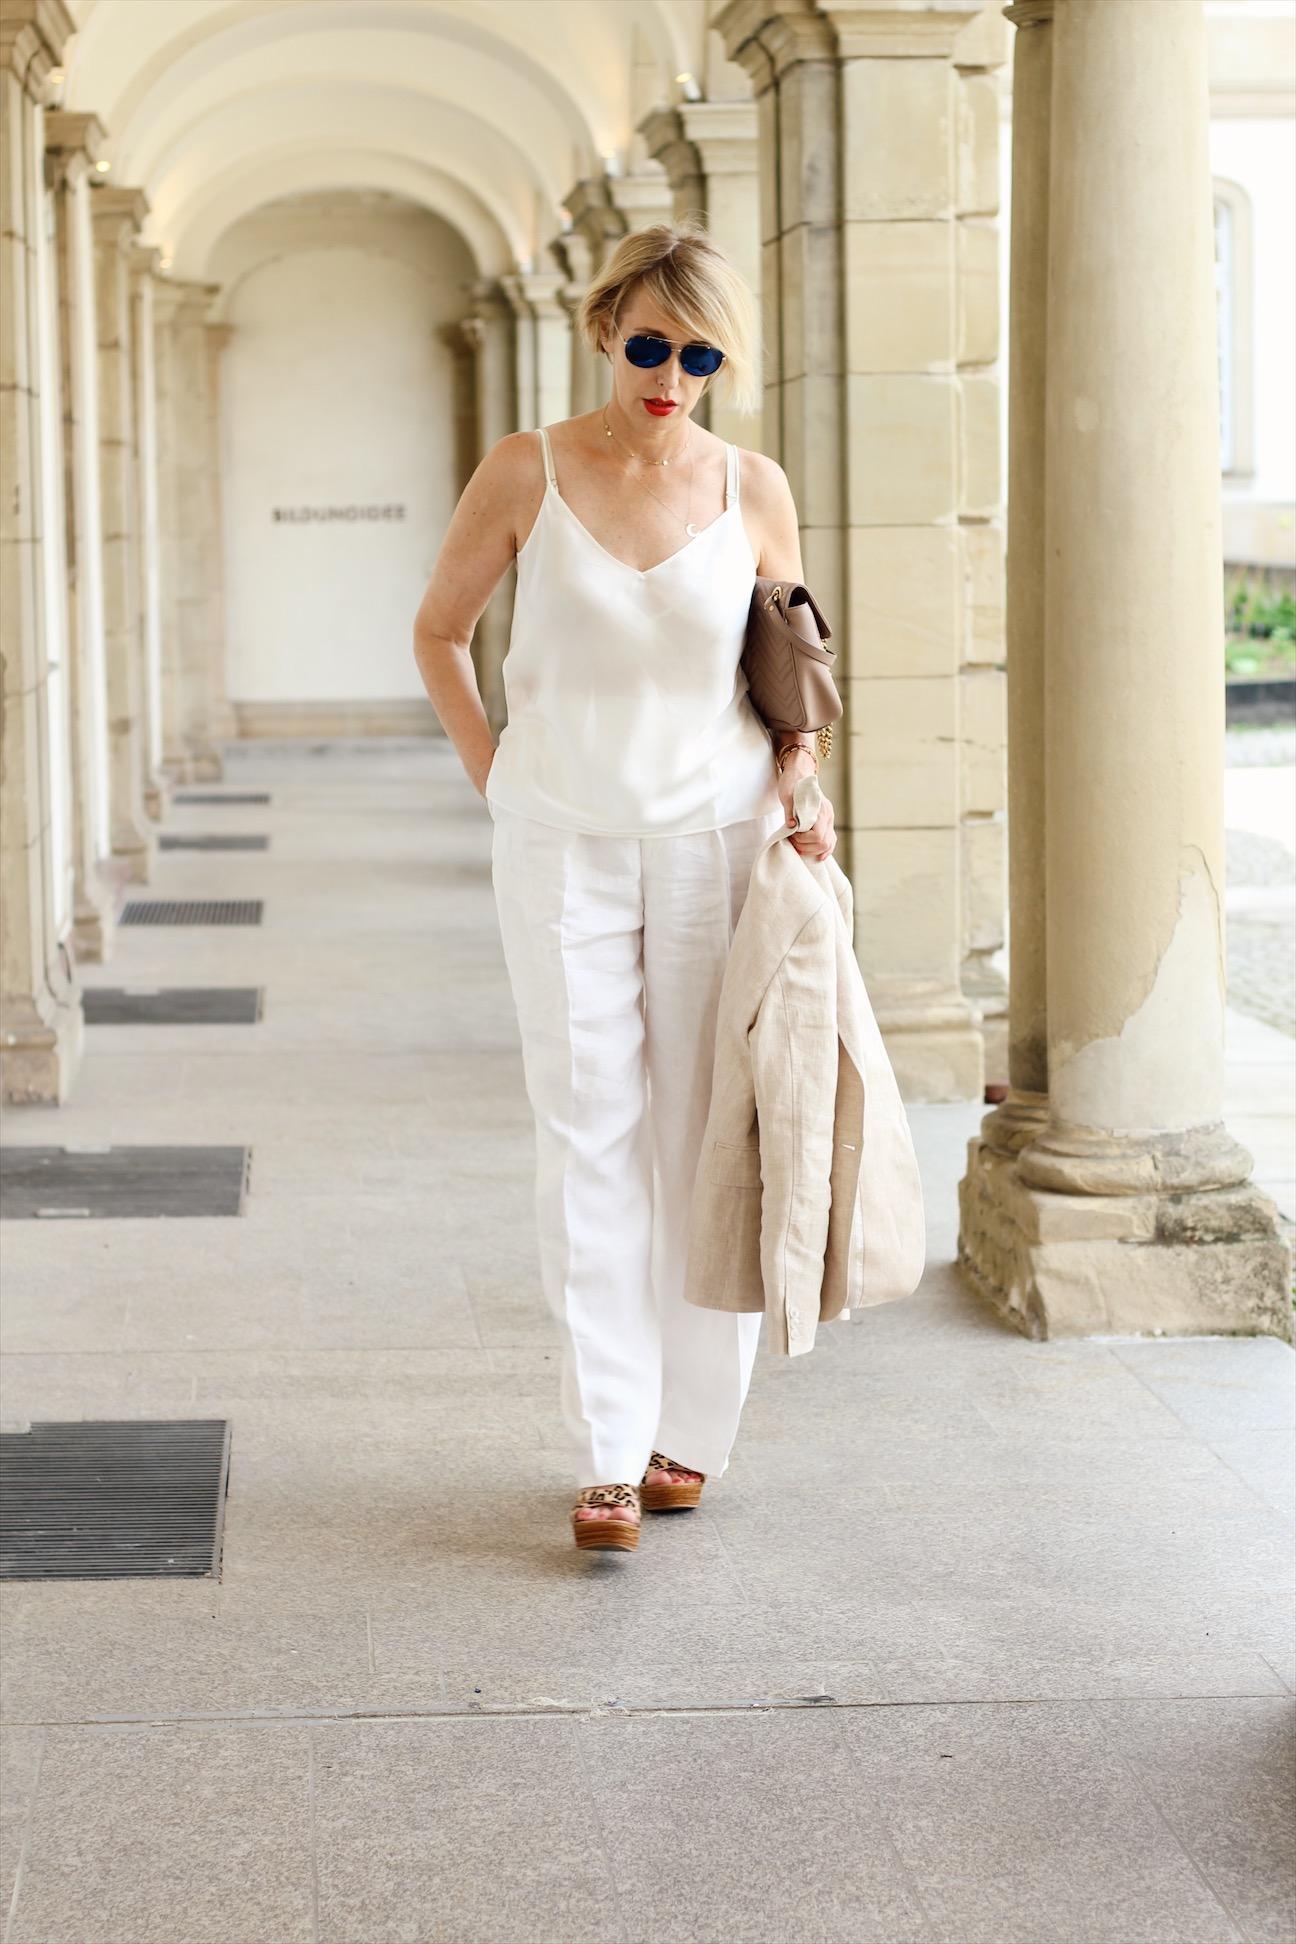 glamupyourlifestyle leinenanzug leinenhose ue-40-blog ue-50-blog ü-40-mode ü-40-blog sommeranzug hosenanzug-damen